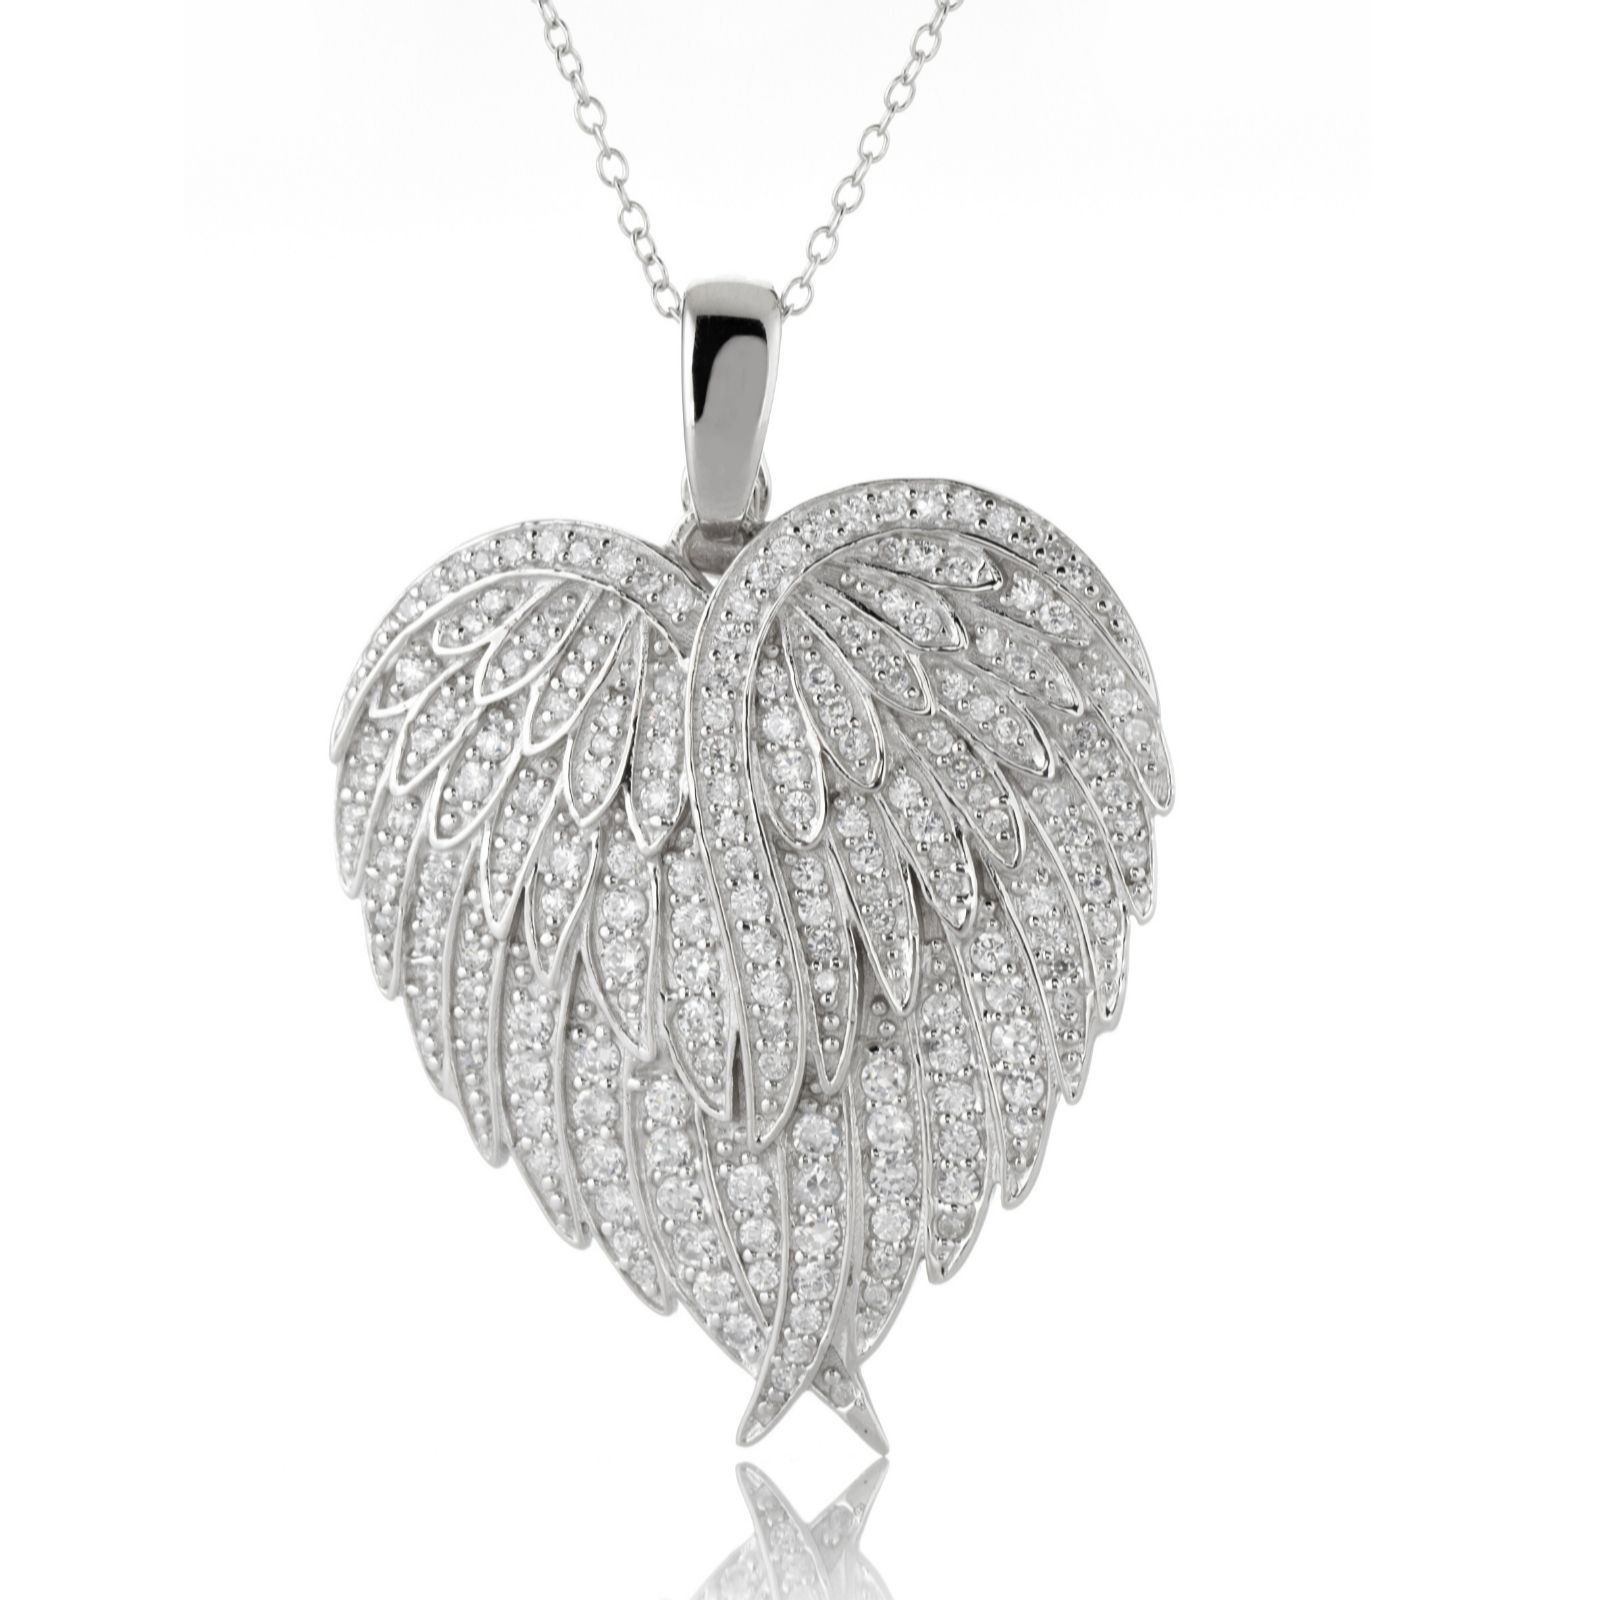 Diamonique 26ct tw wing heart pendant 60cm chain sterling silver diamonique 26ct tw wing heart pendant 60cm chain sterling silver page 1 qvc uk aloadofball Gallery